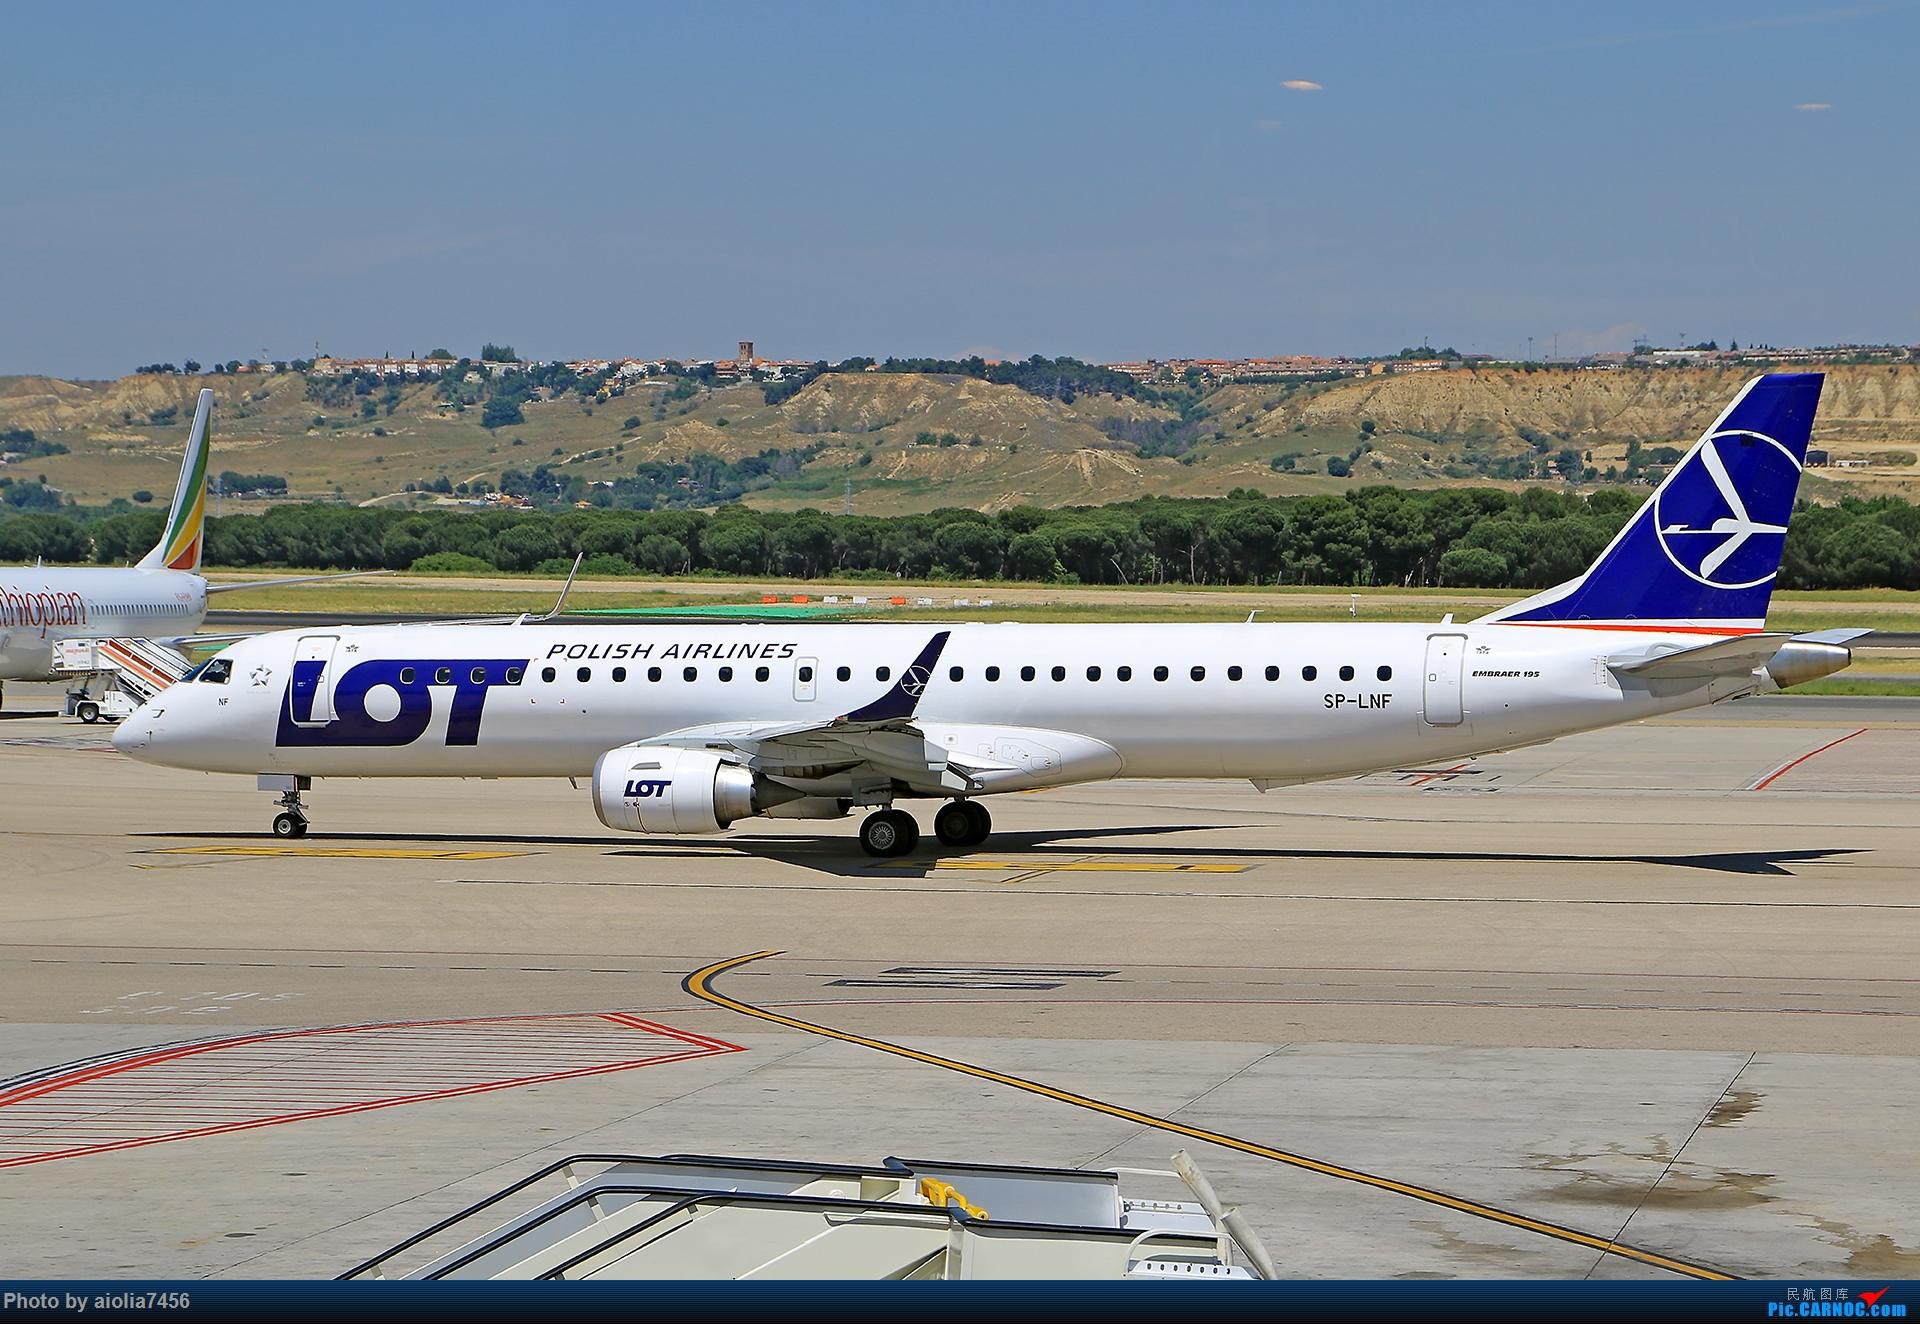 Re:[原创]【合肥飞友会】西行归来第二弹--西行拍机 EMBRAER E-195 SP-LNF 西班牙马德里机场